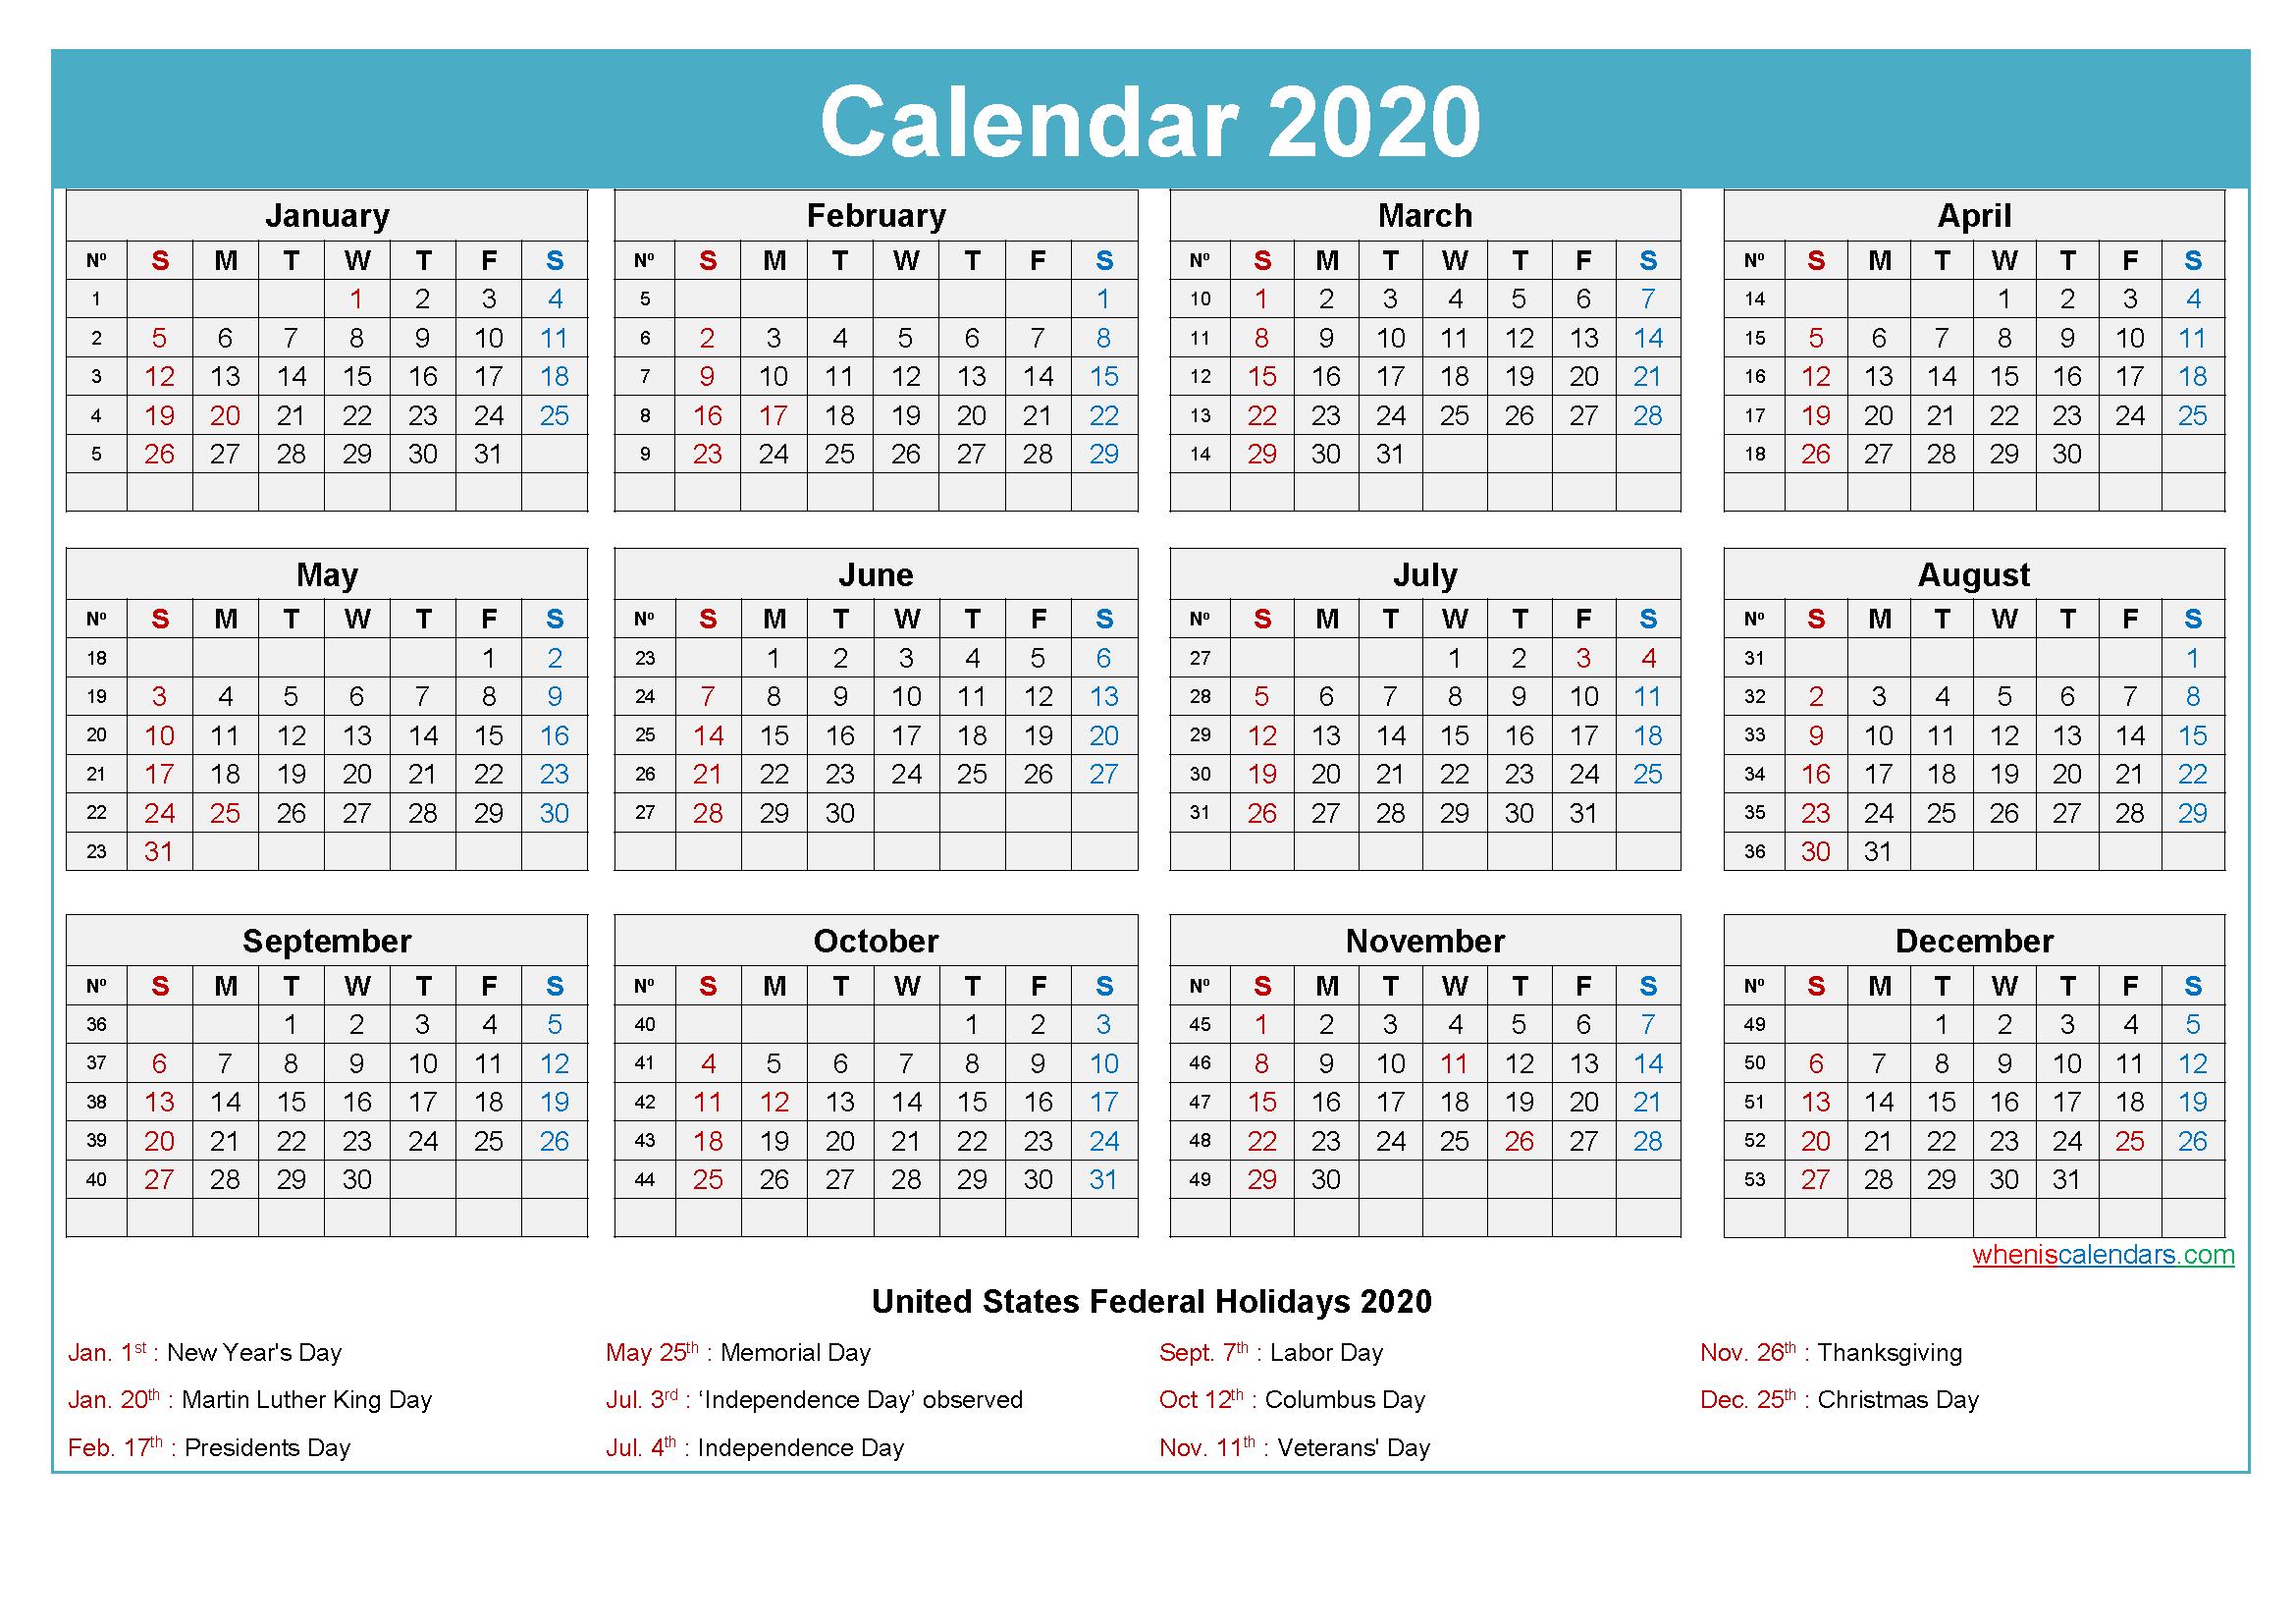 Maxine Desk Calendar 2020 with Holidays Printable